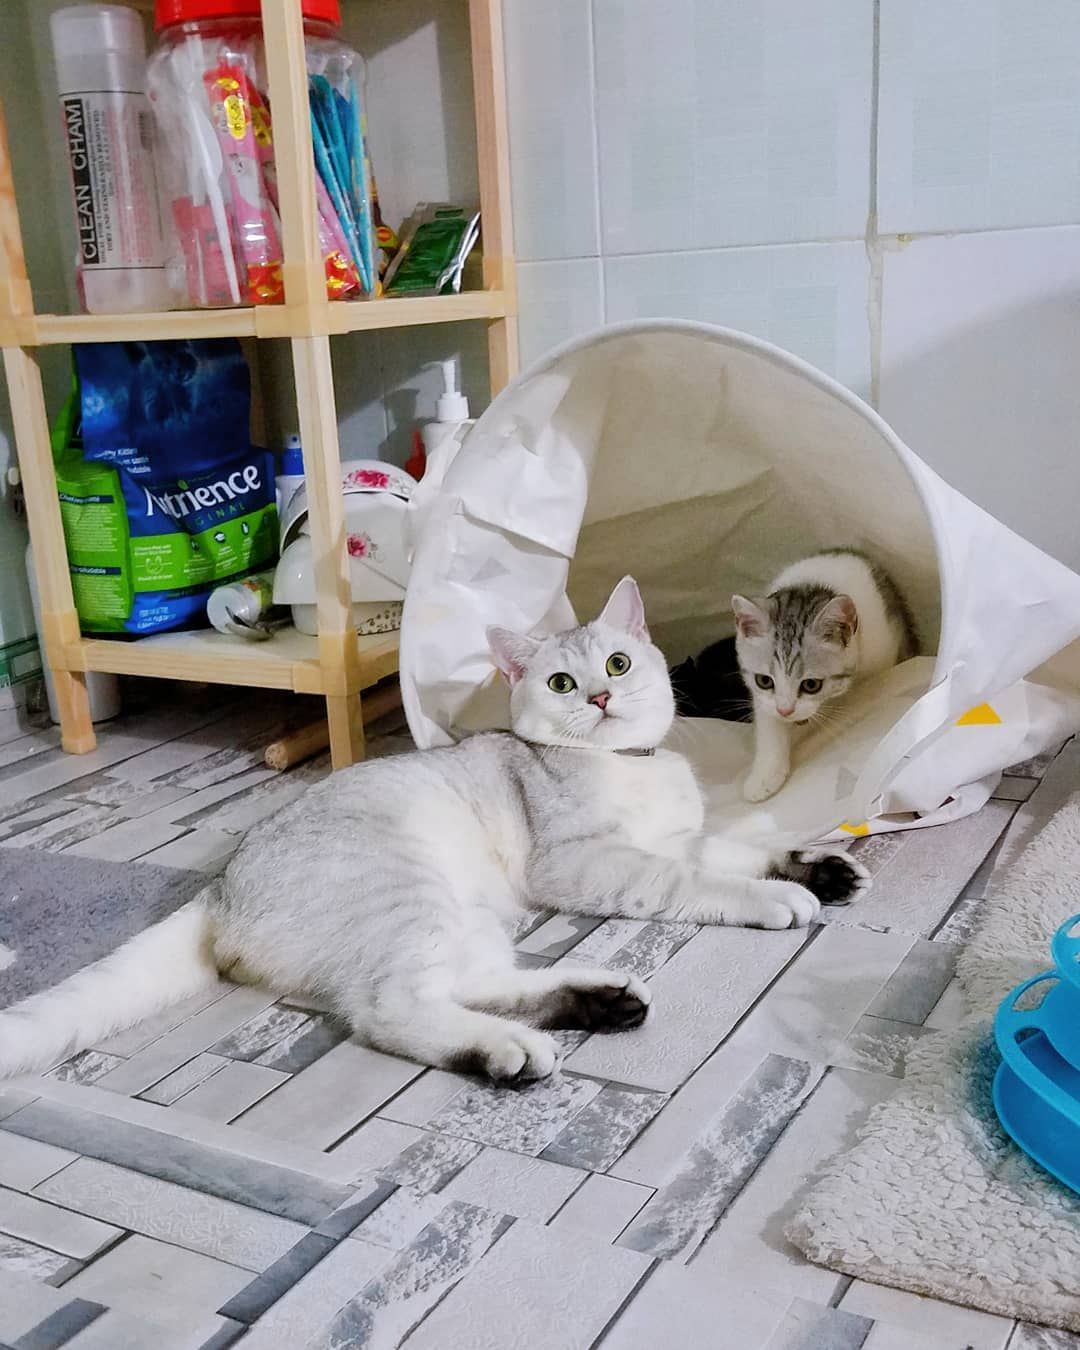 Nghịch Cai Sọt Quần Ao Lien Hồi Noelthecat Minminthecat Cat Cats Catstagram Tabbycat Tabby Tabbykitten Cats Of Instagram Sco Animals